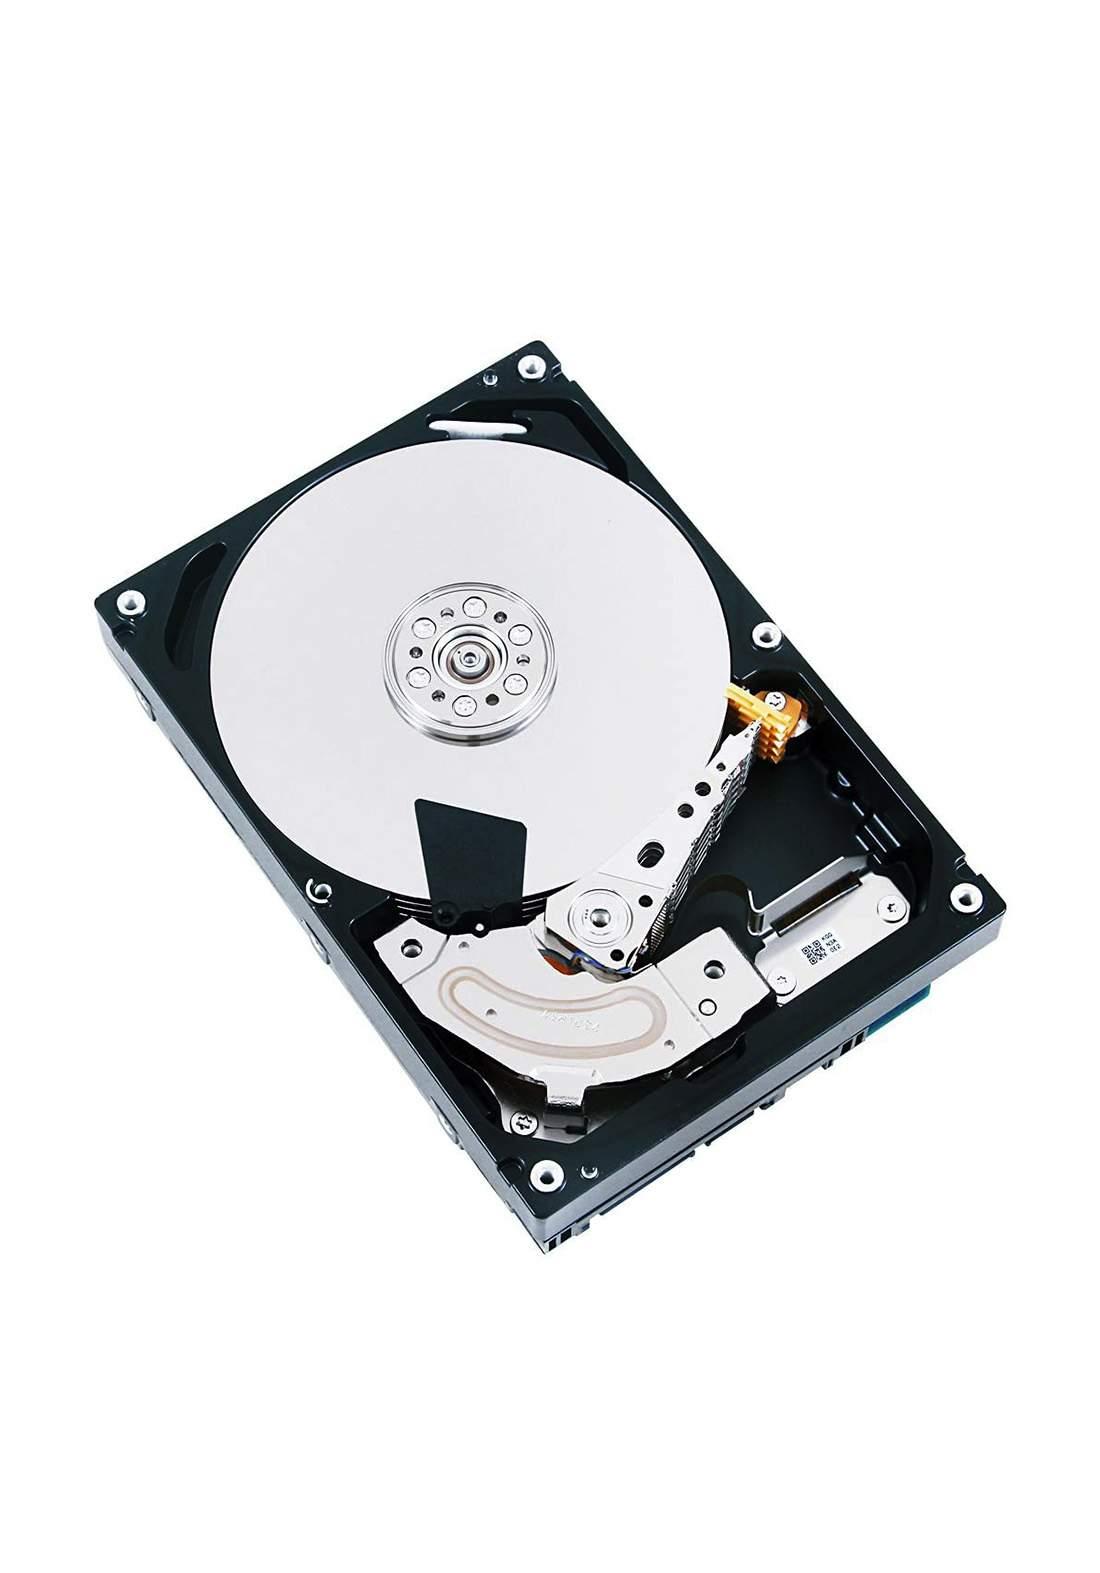 Toshiba 7200rpm 1TB  3.5-inch Sata III Internal Hard Disk Drive هارد داخلي